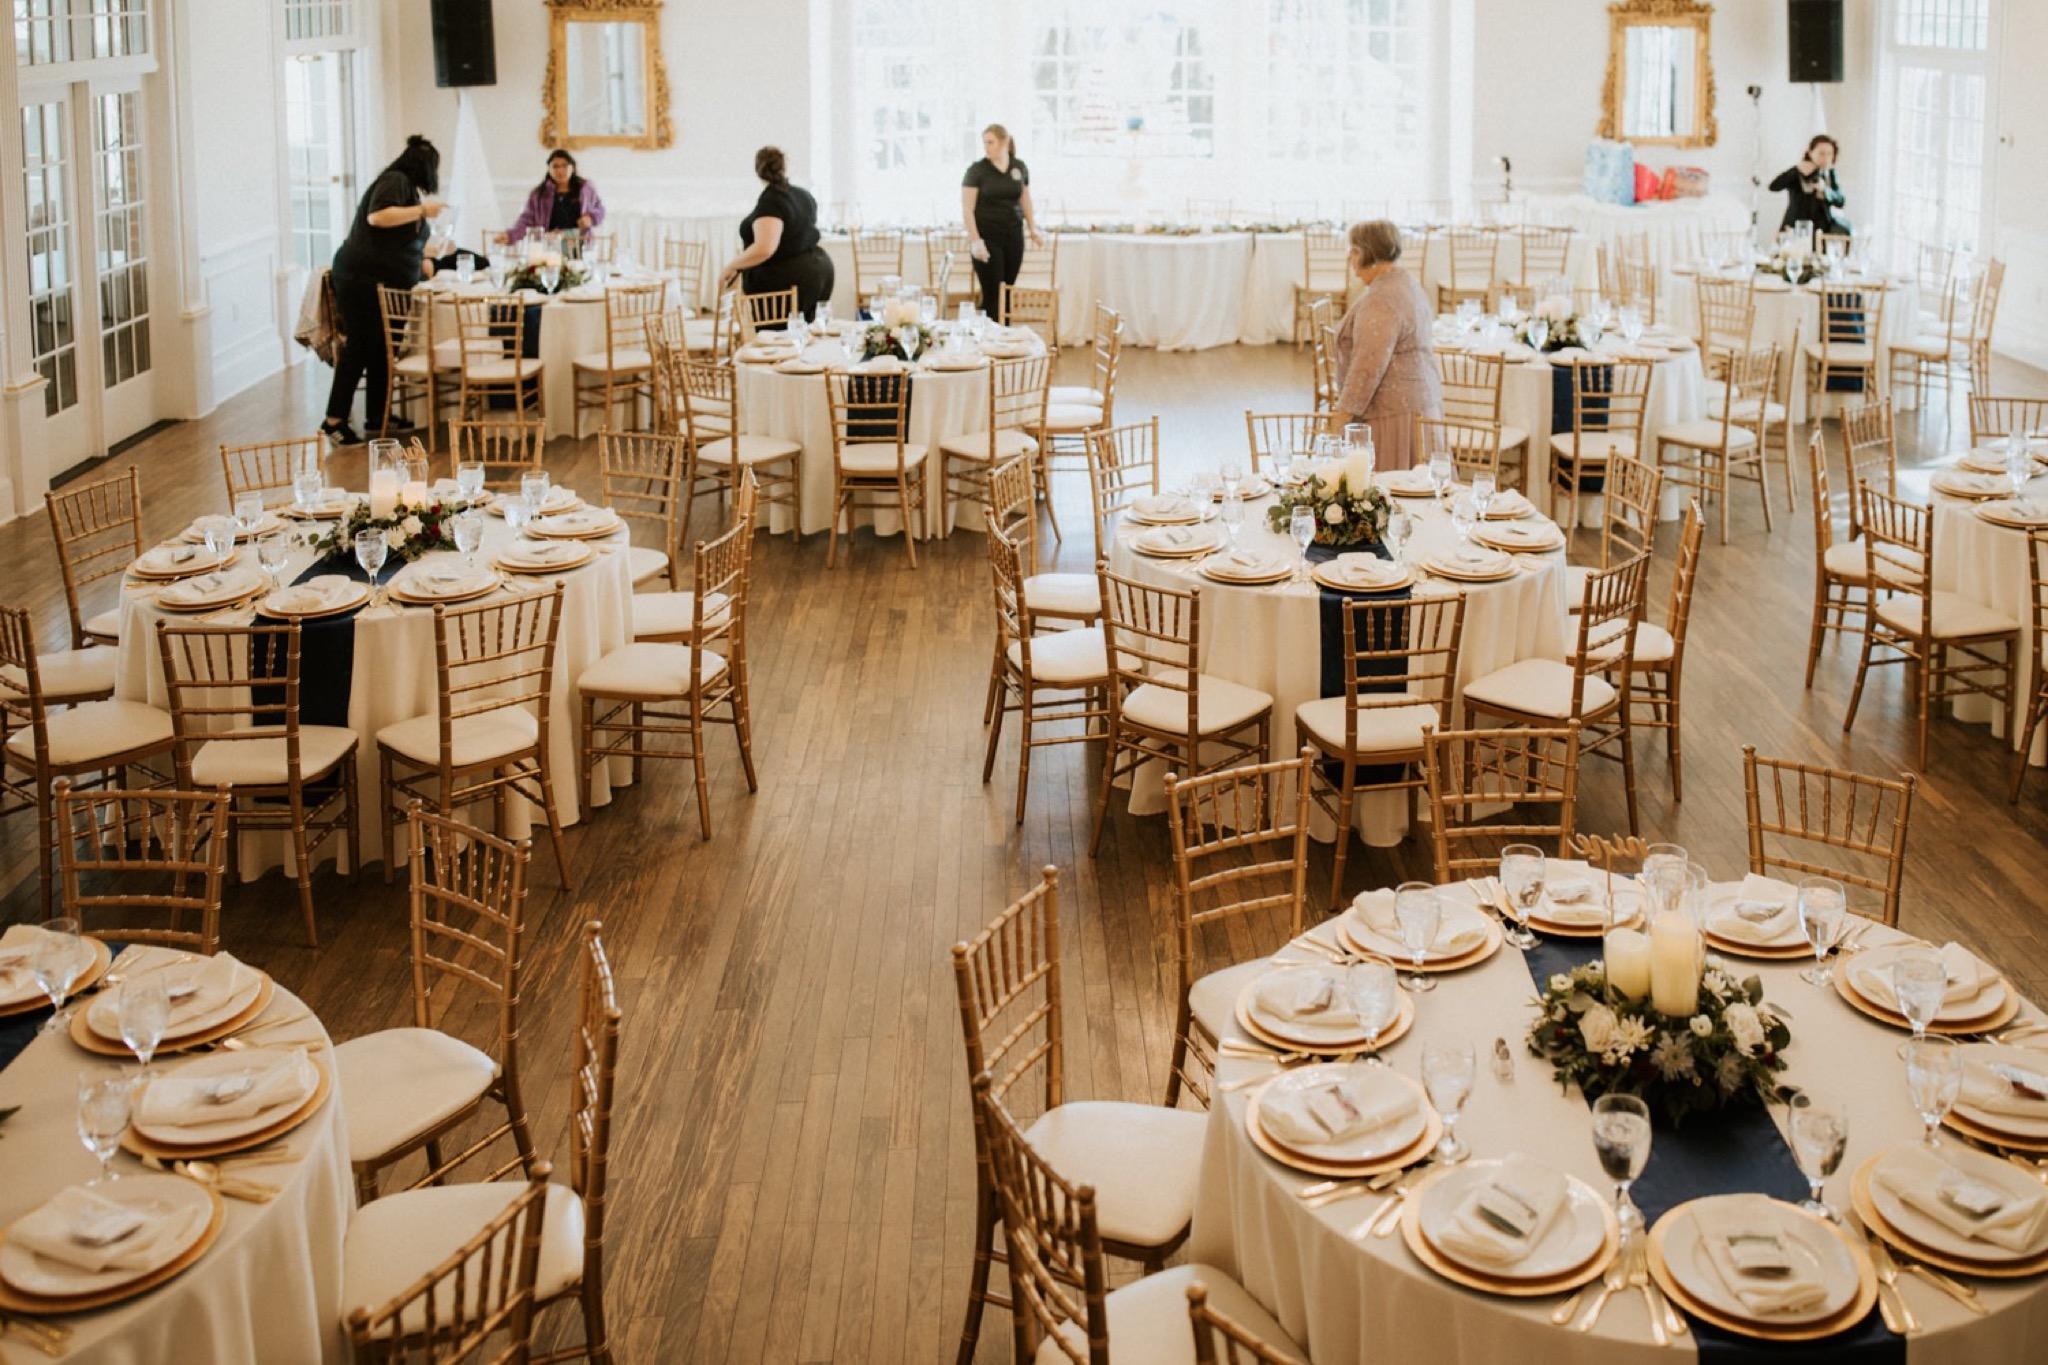 36_West Manor Estate Weddings - Pat Cori Photography-78_details_VirginiaWeddingPhotographer_WestManorEstate_reception_PatCoriPhotography.jpg